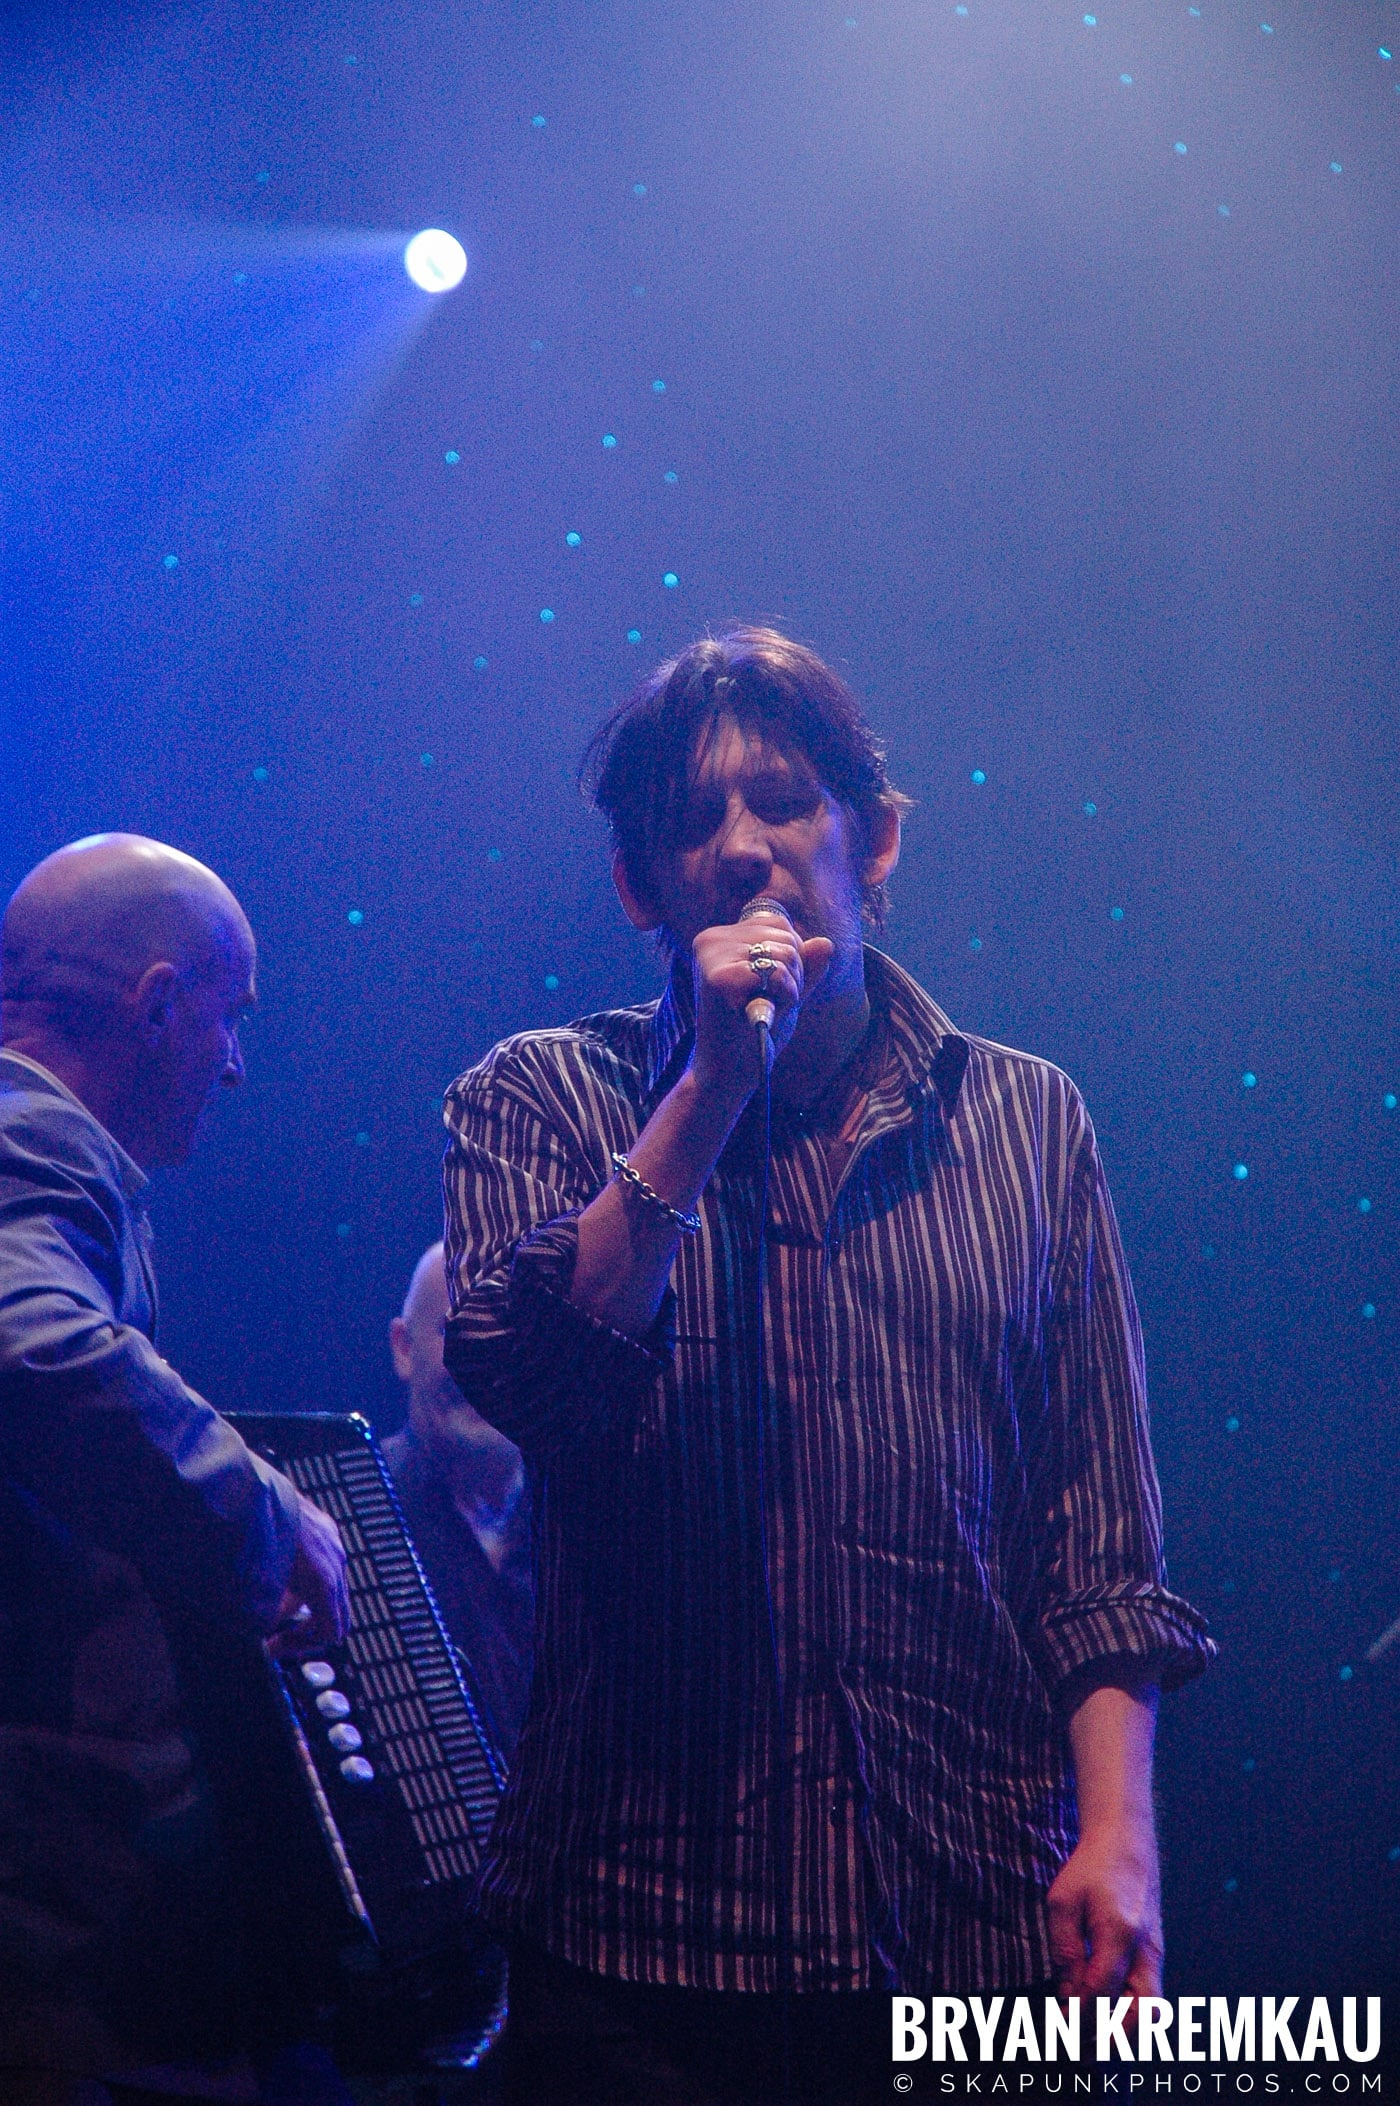 The Pogues @ Brixton Academy, London UK - 12.19.05 (21)